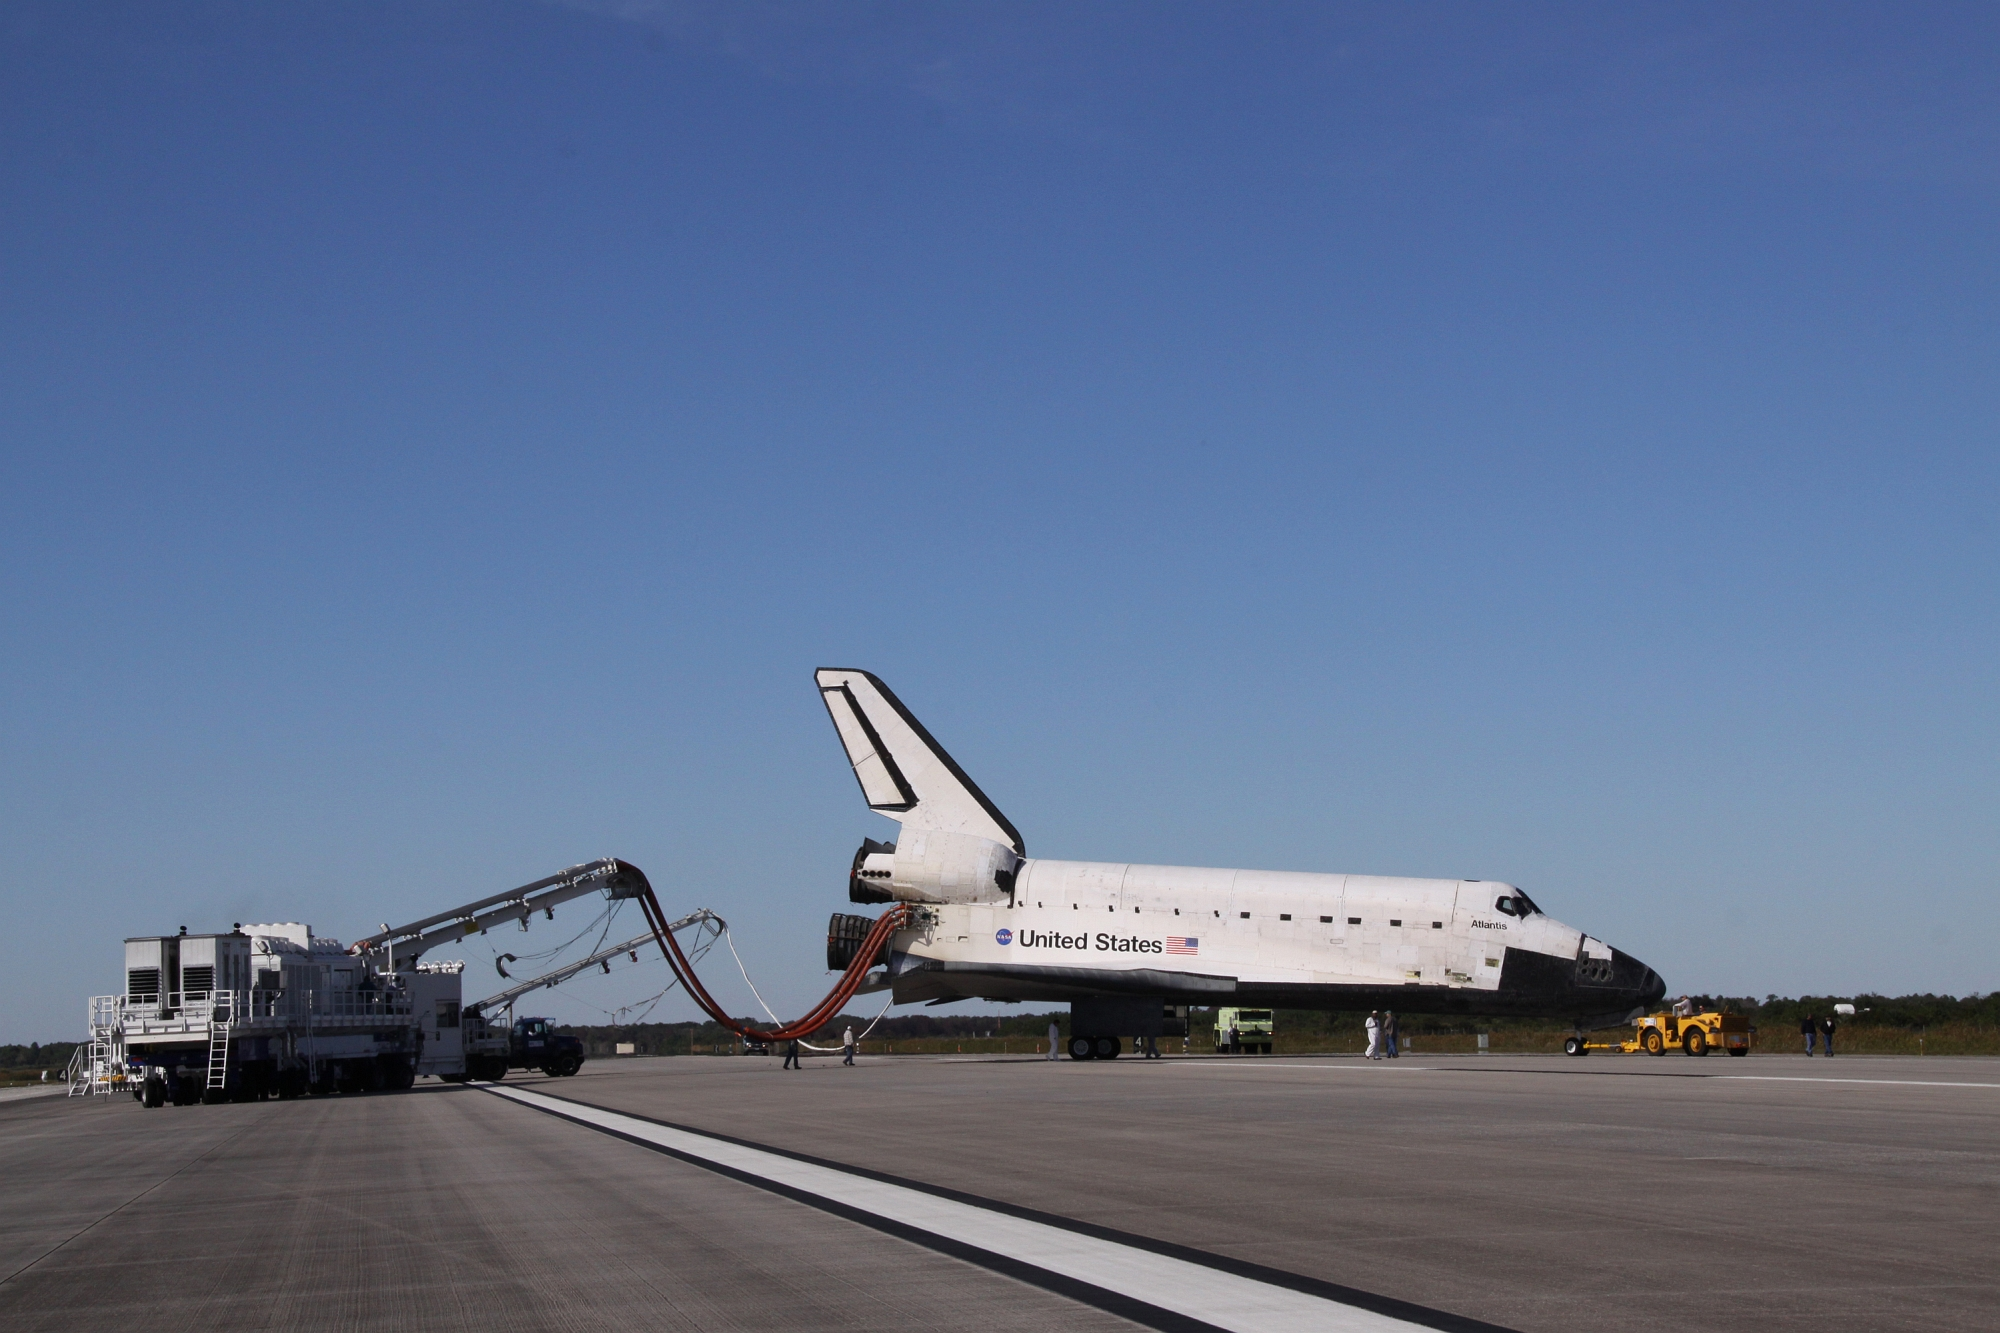 space shuttle atlantis landing - photo #49